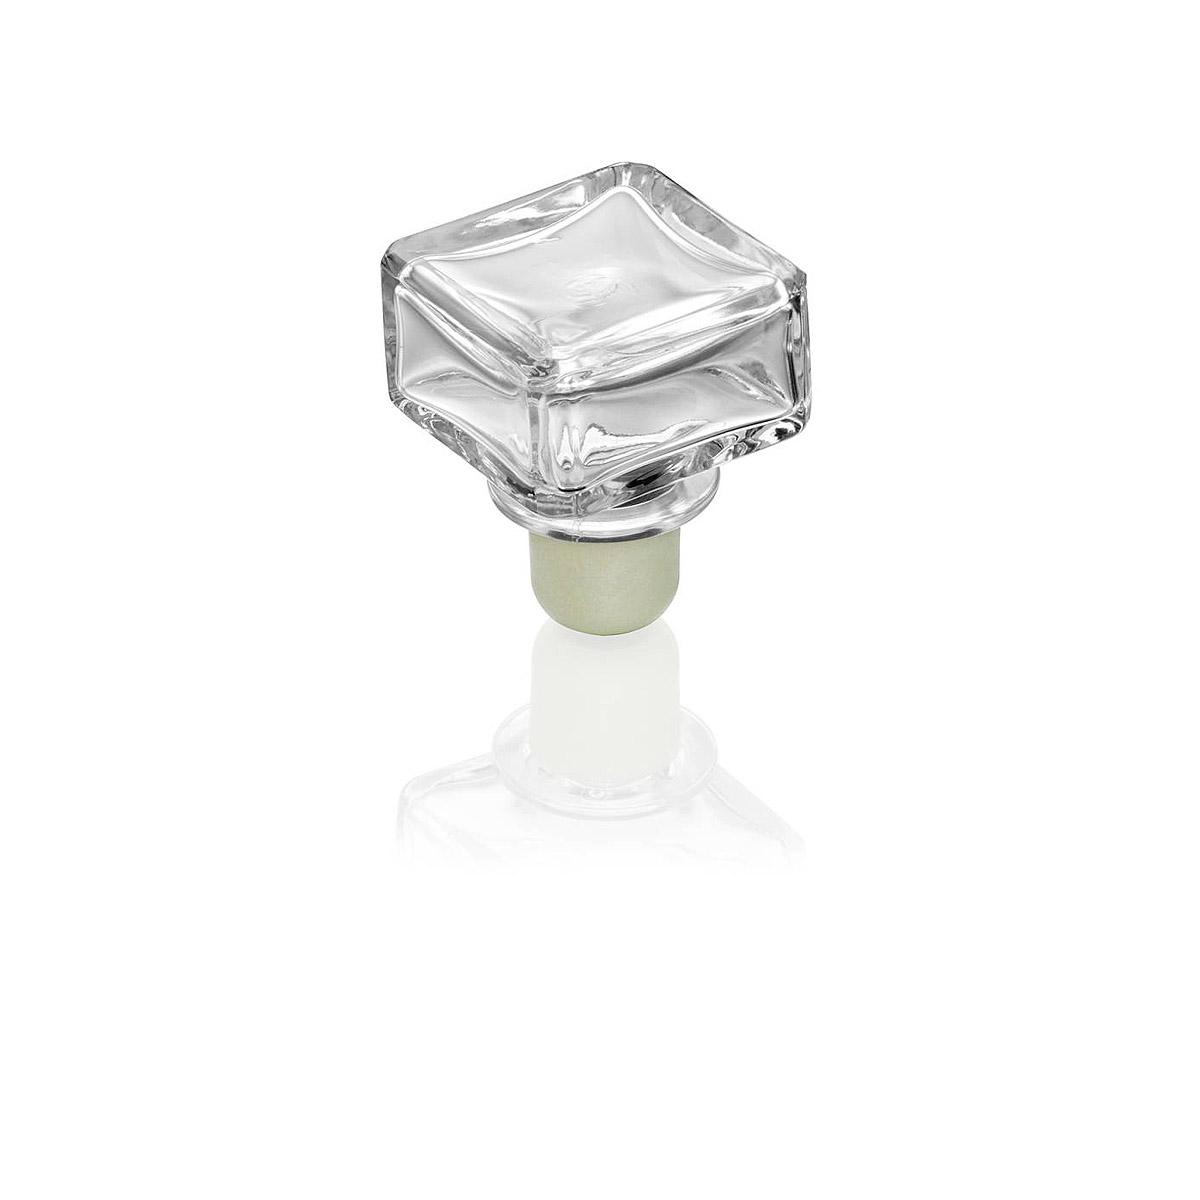 thetis pack γυάλινη κεφαλή συνθετικό σώμα glass head synthetic stem cap